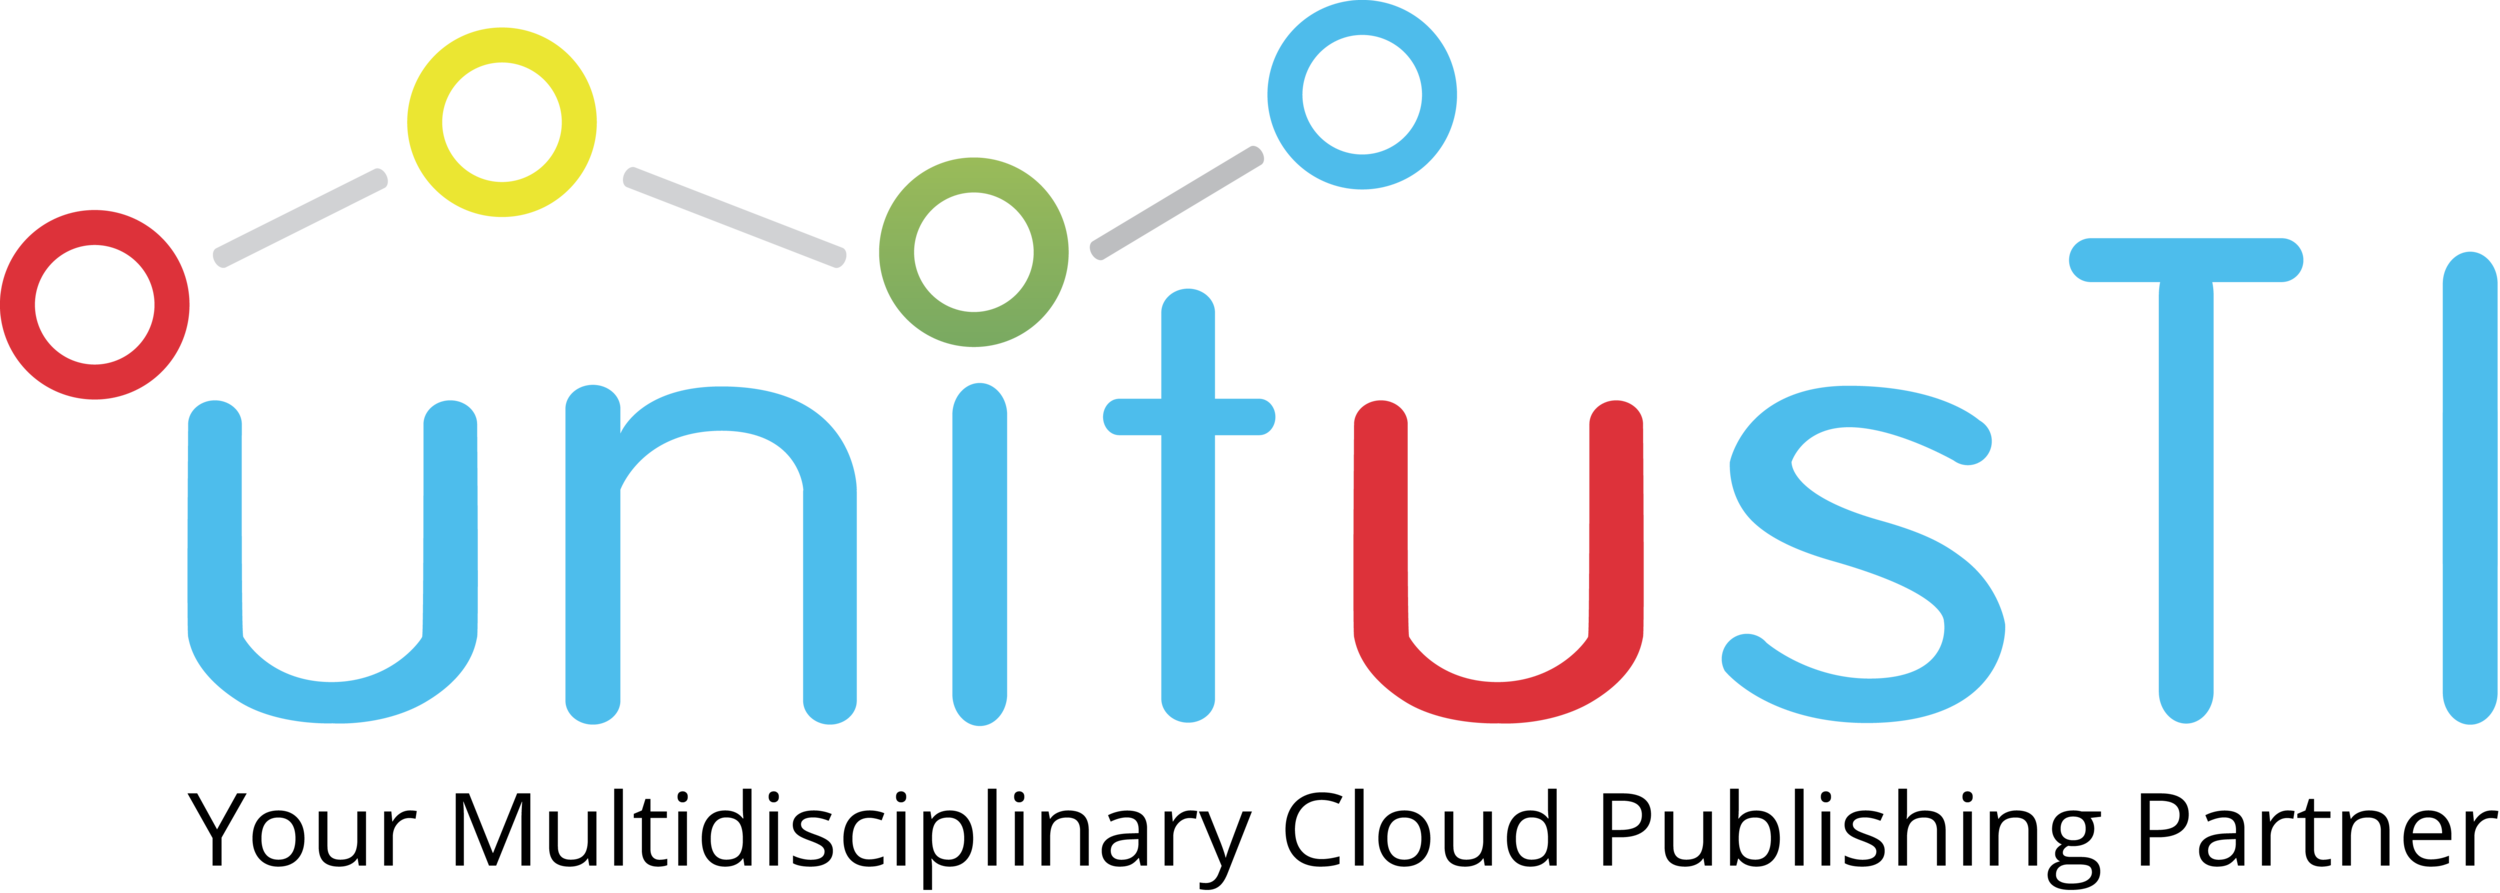 UnitusTI multidis logo 2.png